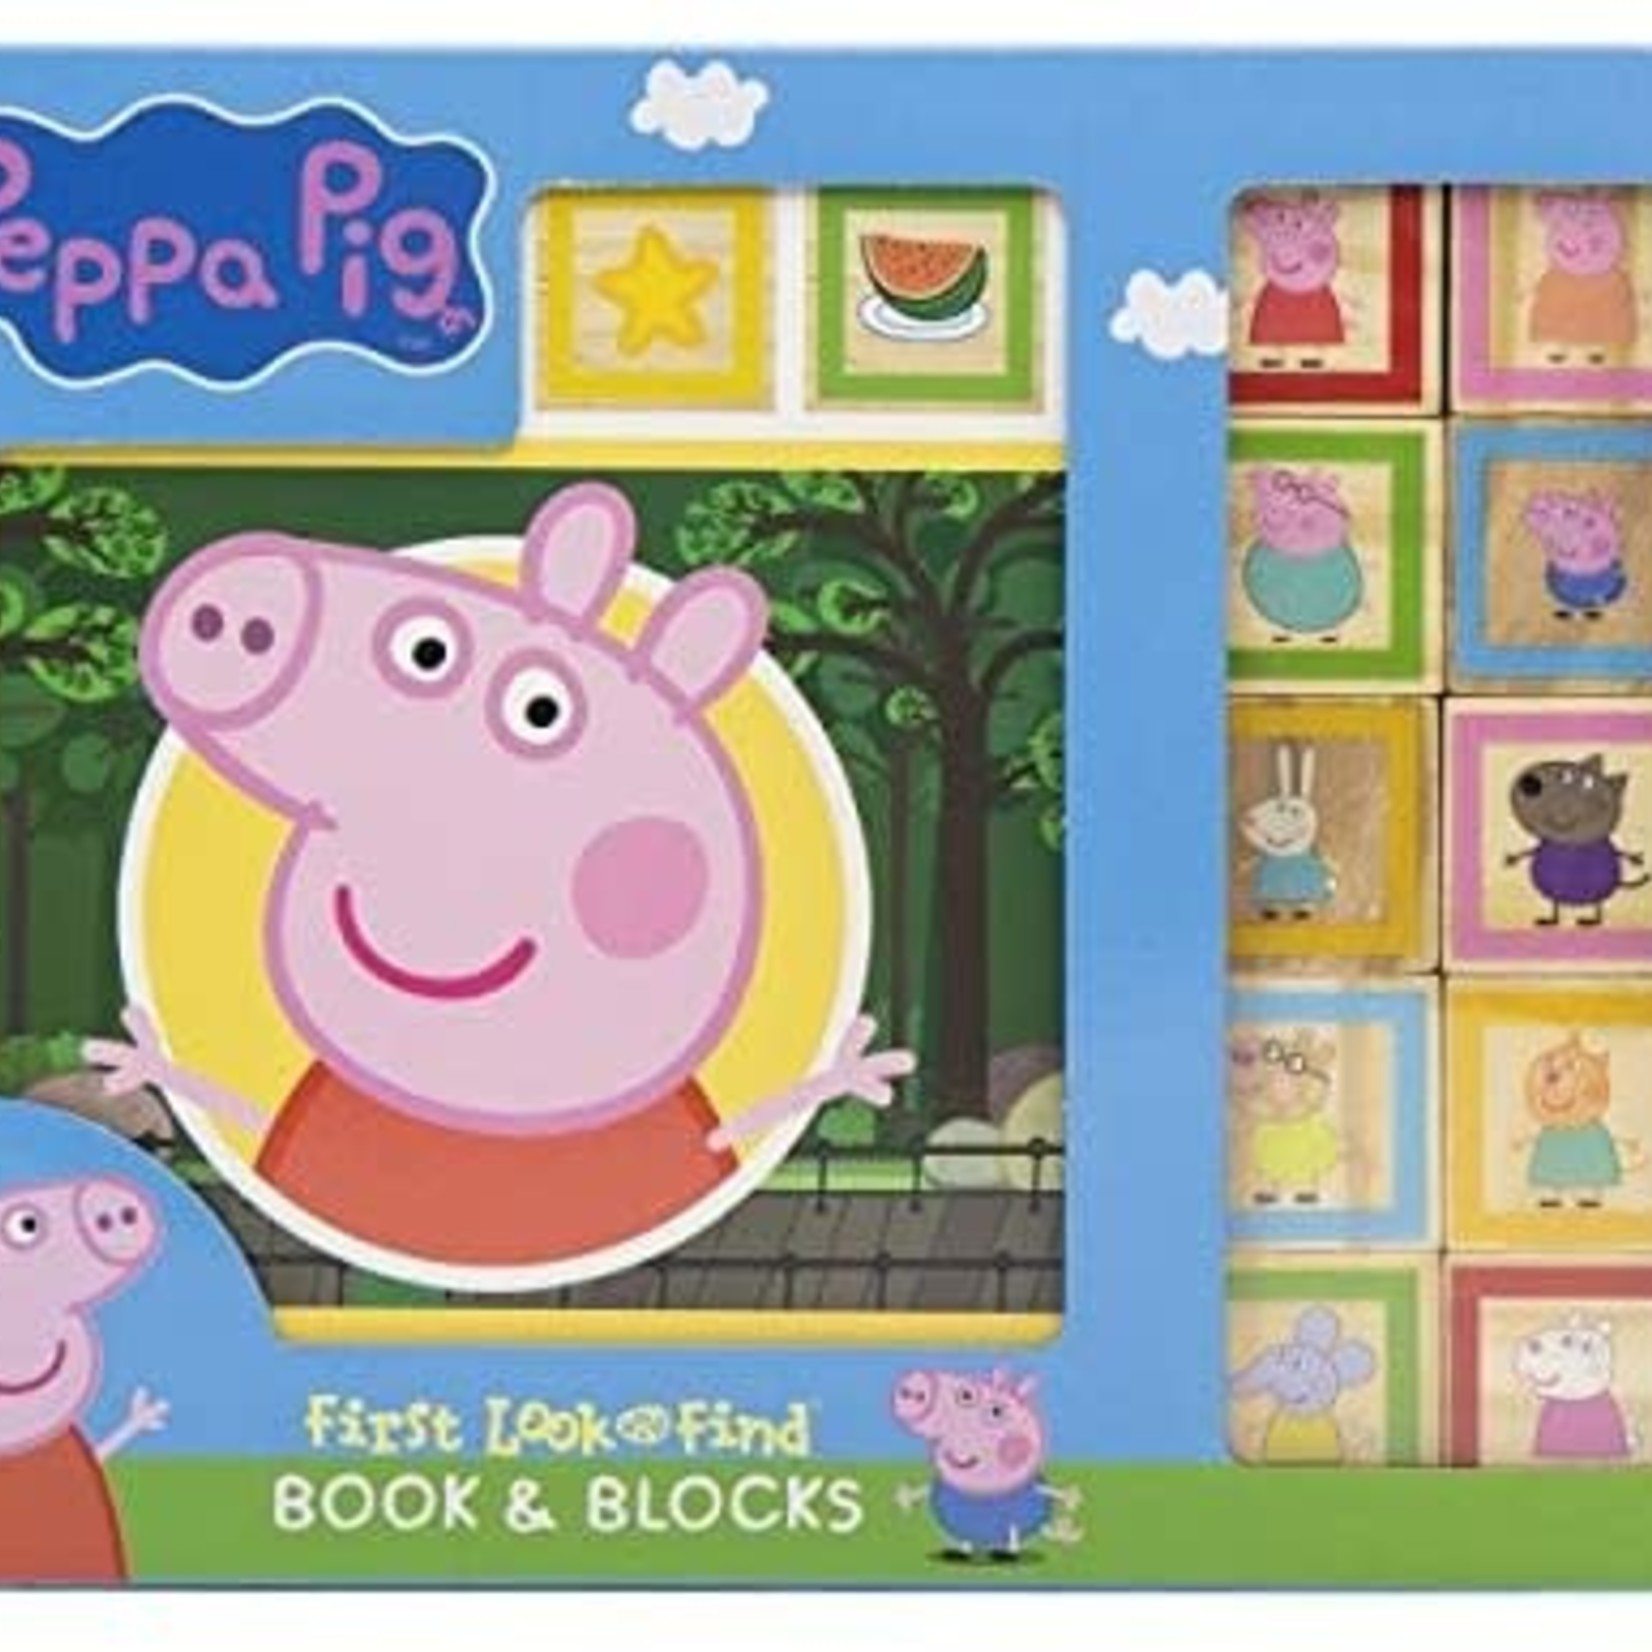 Peppa Pig Book & Blocks